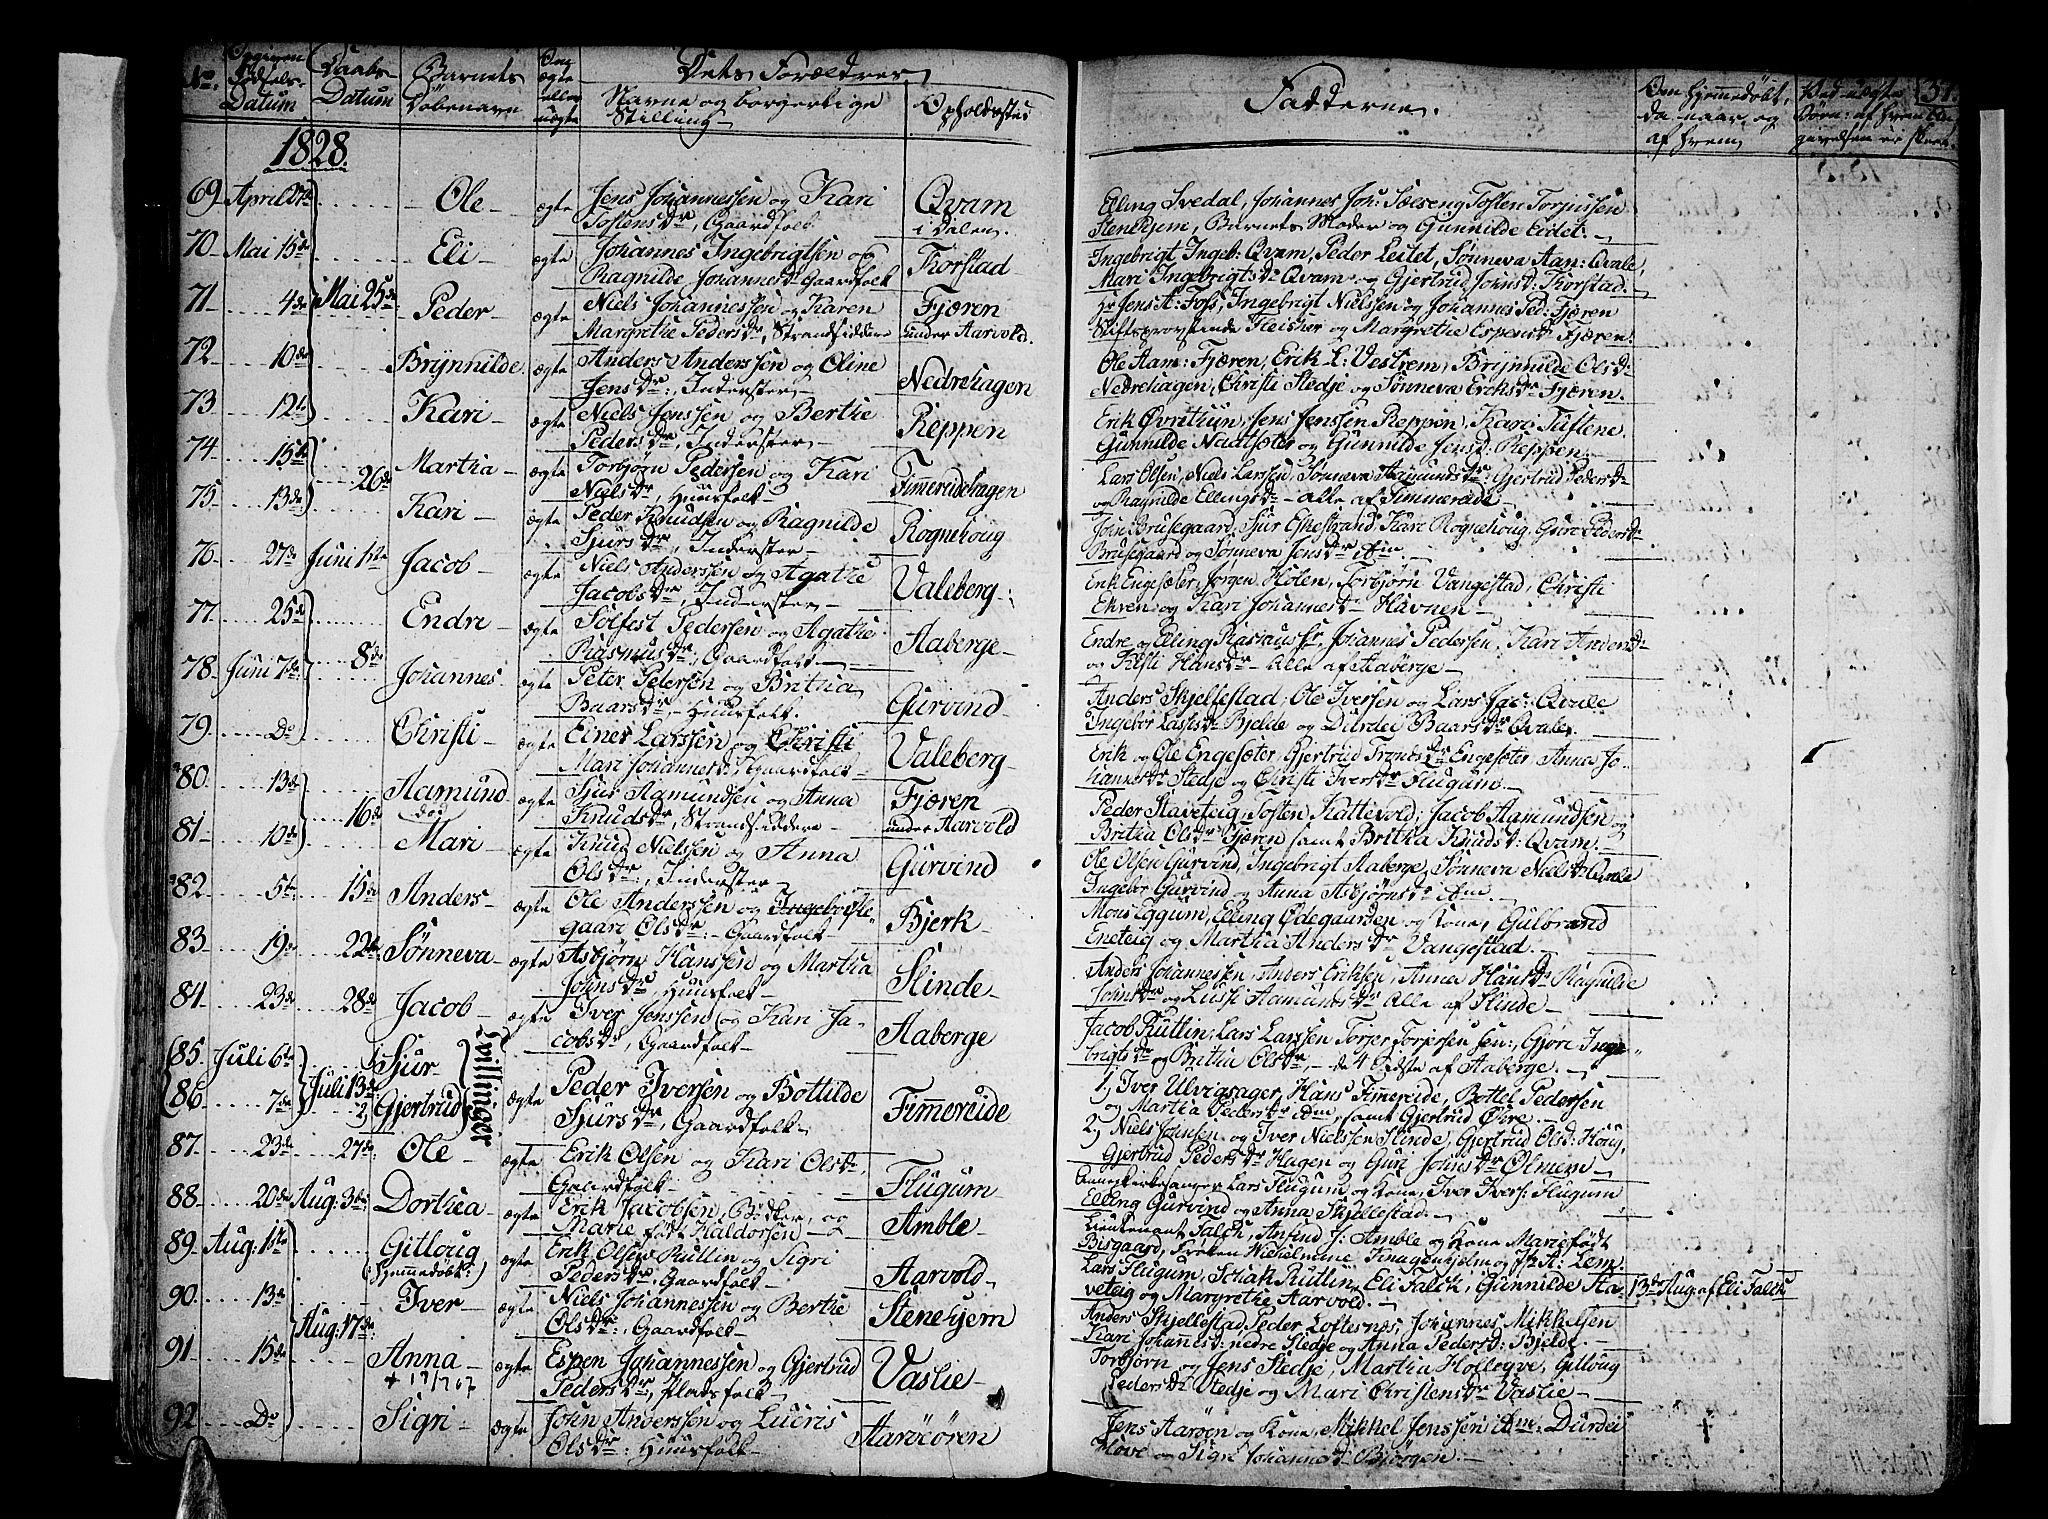 SAB, Sogndal sokneprestembete, H/Haa/Haaa/L0010: Parish register (official) no. A 10, 1821-1838, p. 37